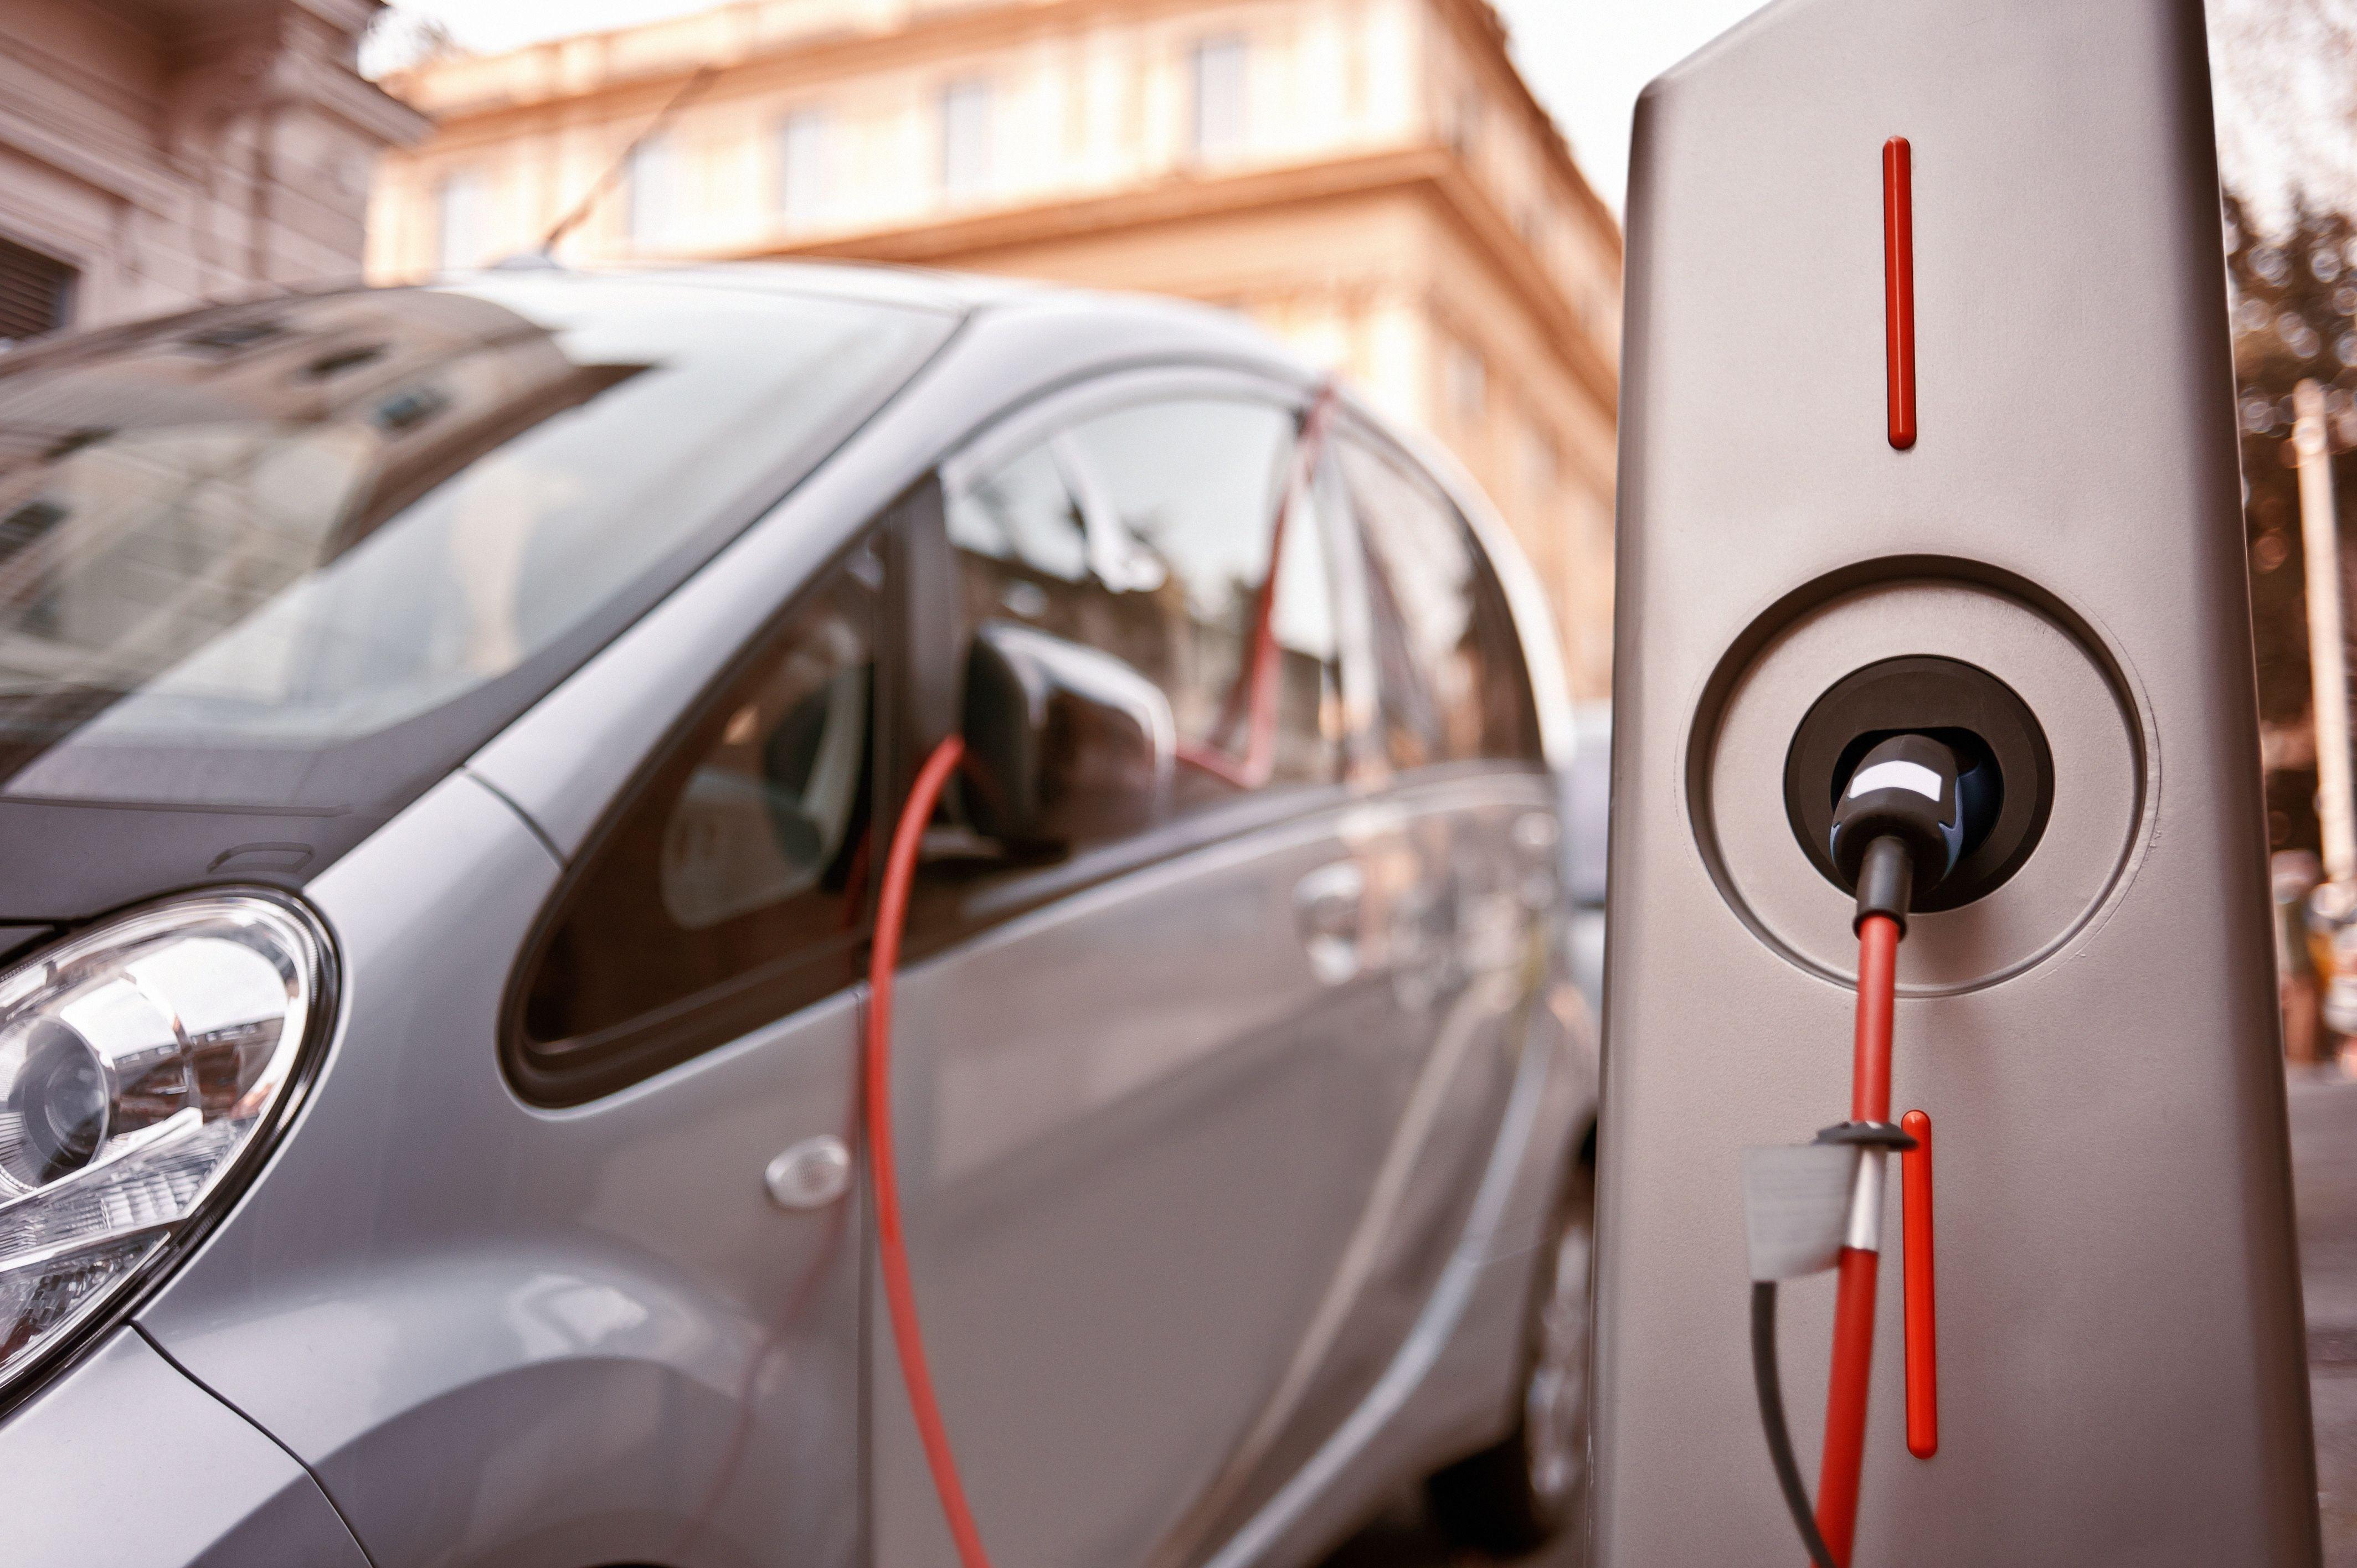 Instalacion de recarga coche eléctrico en Retiro